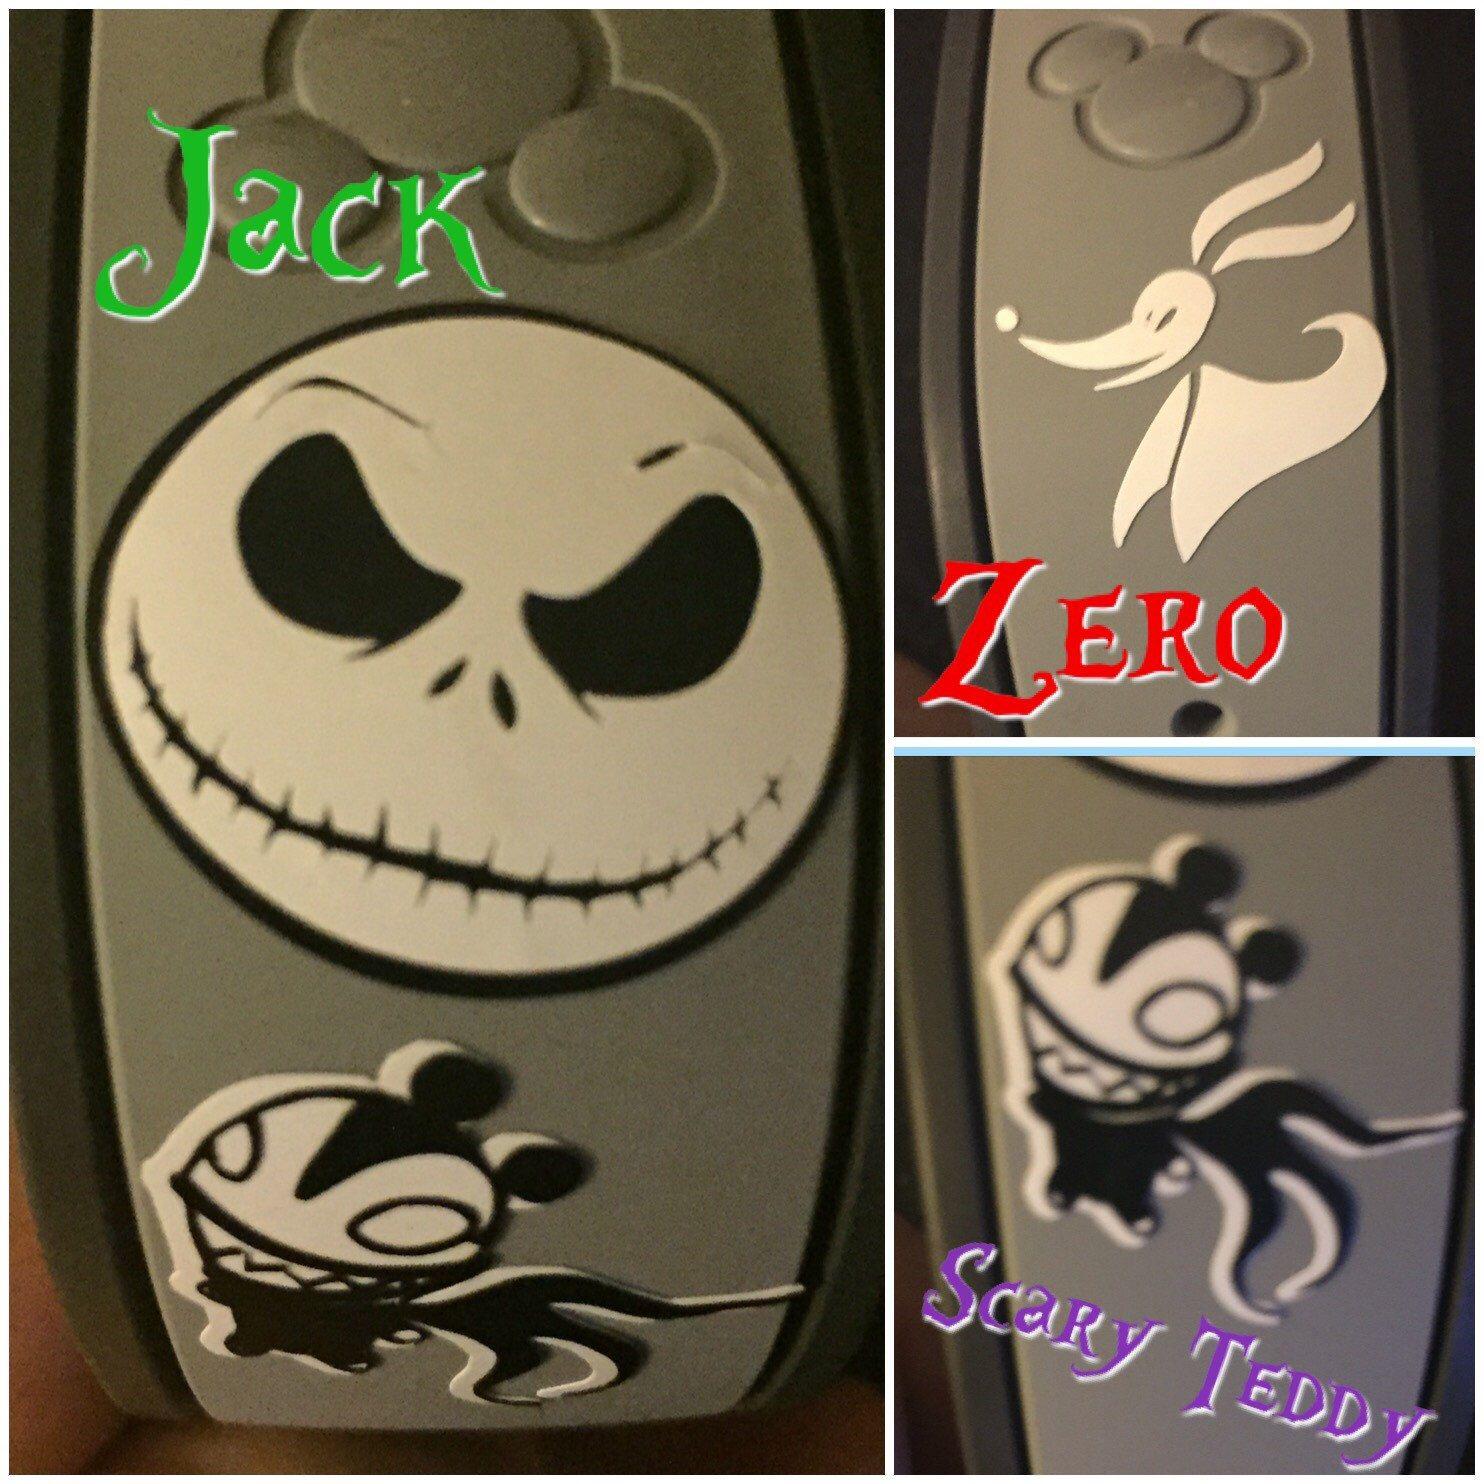 Jack Skellington Magic Band Decal MagicBand Jack Skellington Sticker Jack Skellington MagicBand Decal Magic Band Jack Skellington